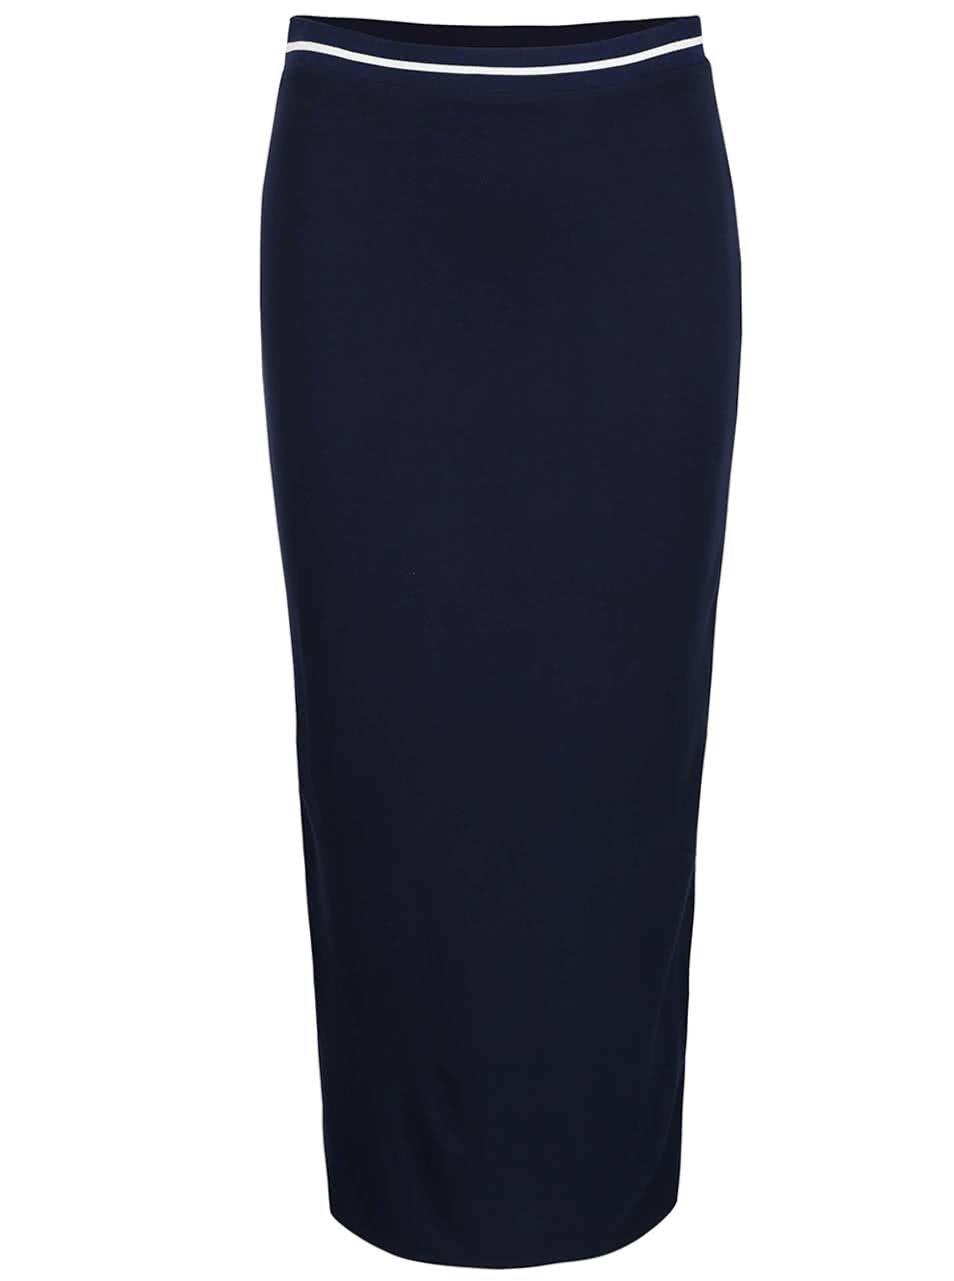 Tmavě modrá dlouhá sukně s bílým lemem Dorothy Perkins ... bcd8cc3b1a